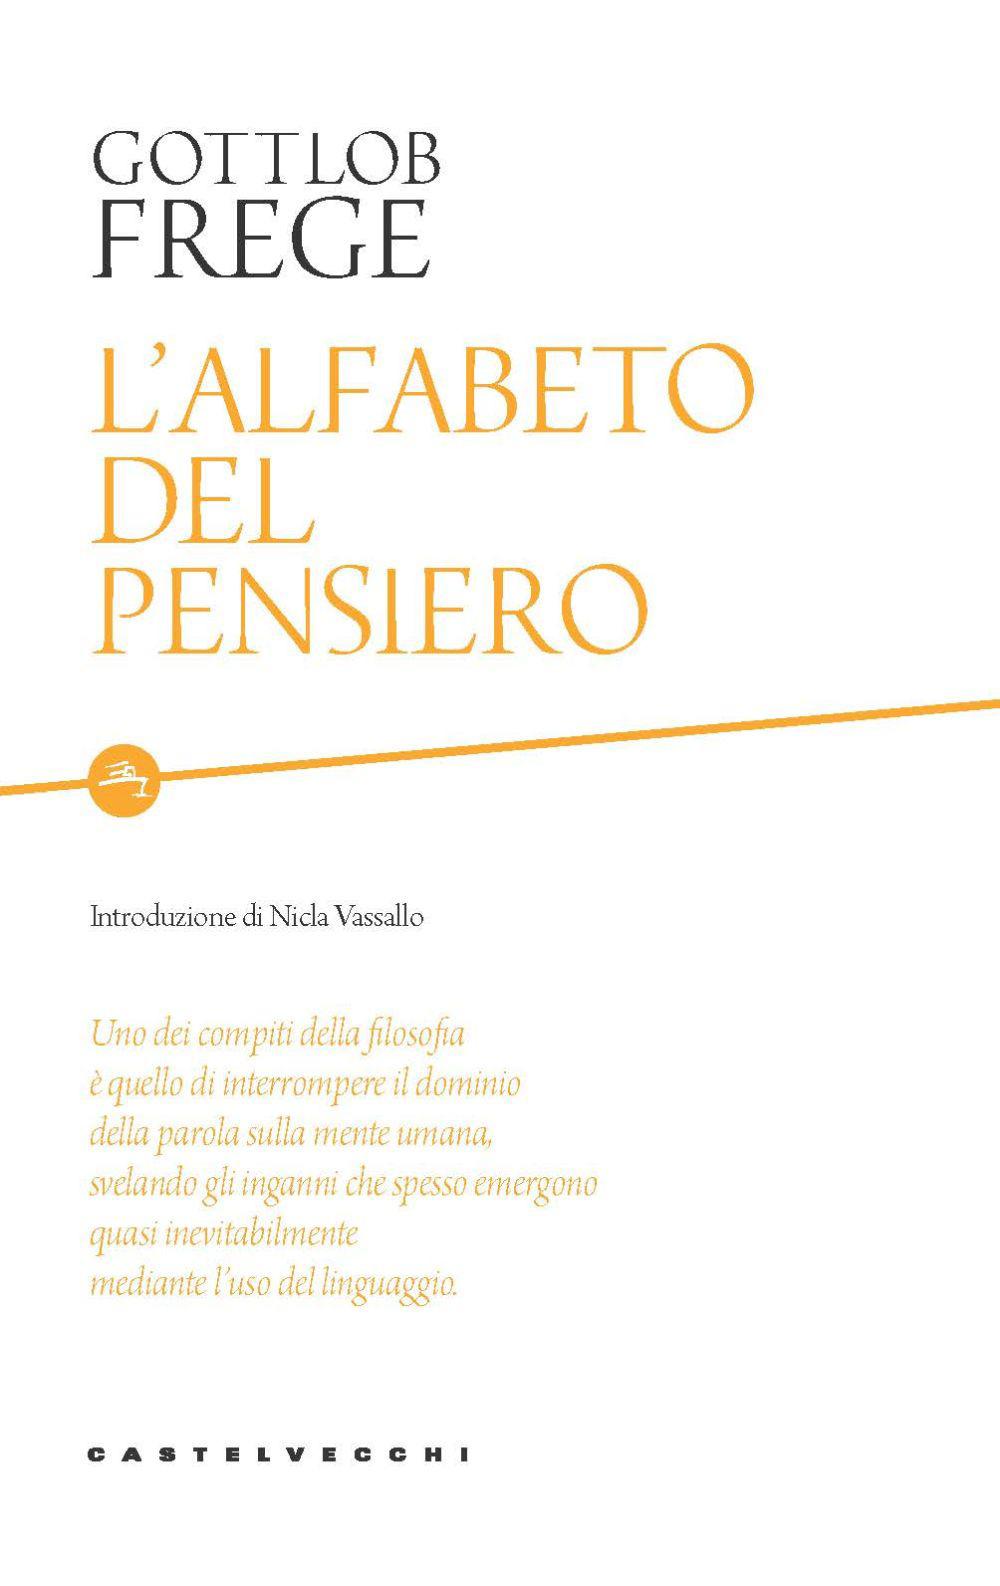 ALFABETO DEL PENSIERO (L') - Frege Gottlob - 9788832900279